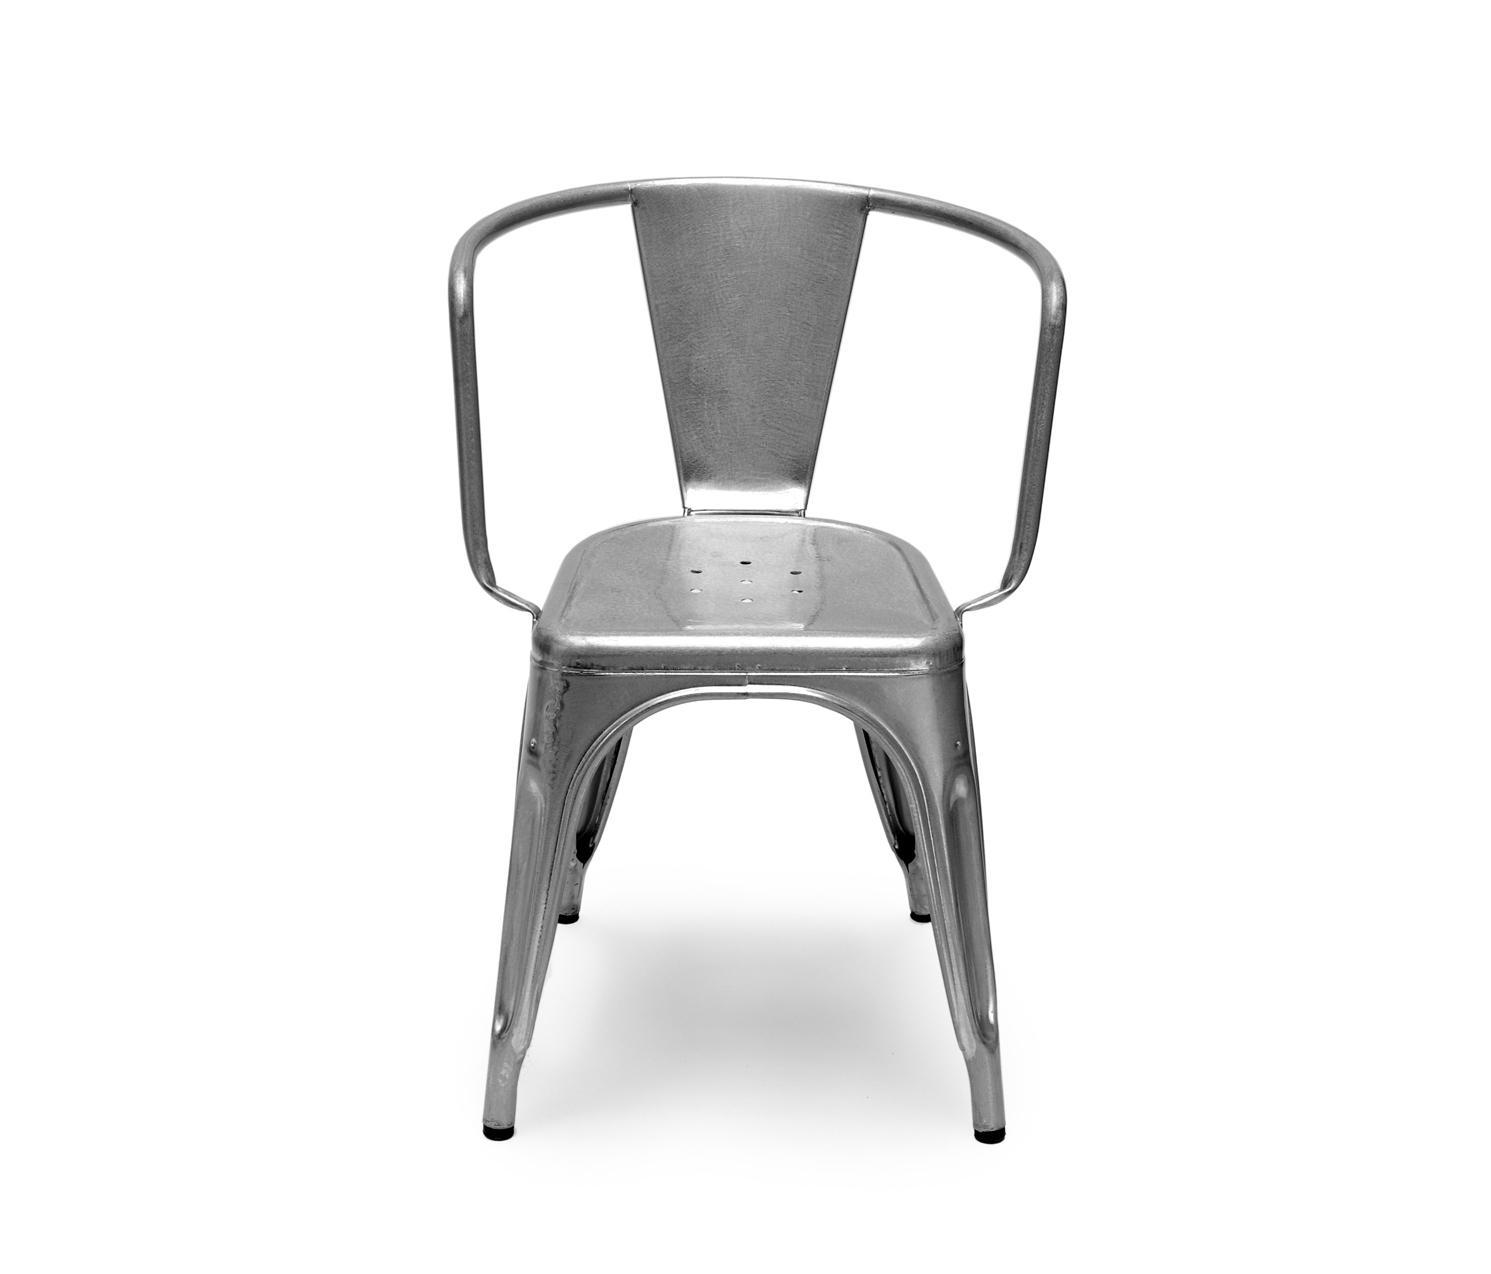 a97 armchair mehrzweckst hle von tolix architonic. Black Bedroom Furniture Sets. Home Design Ideas